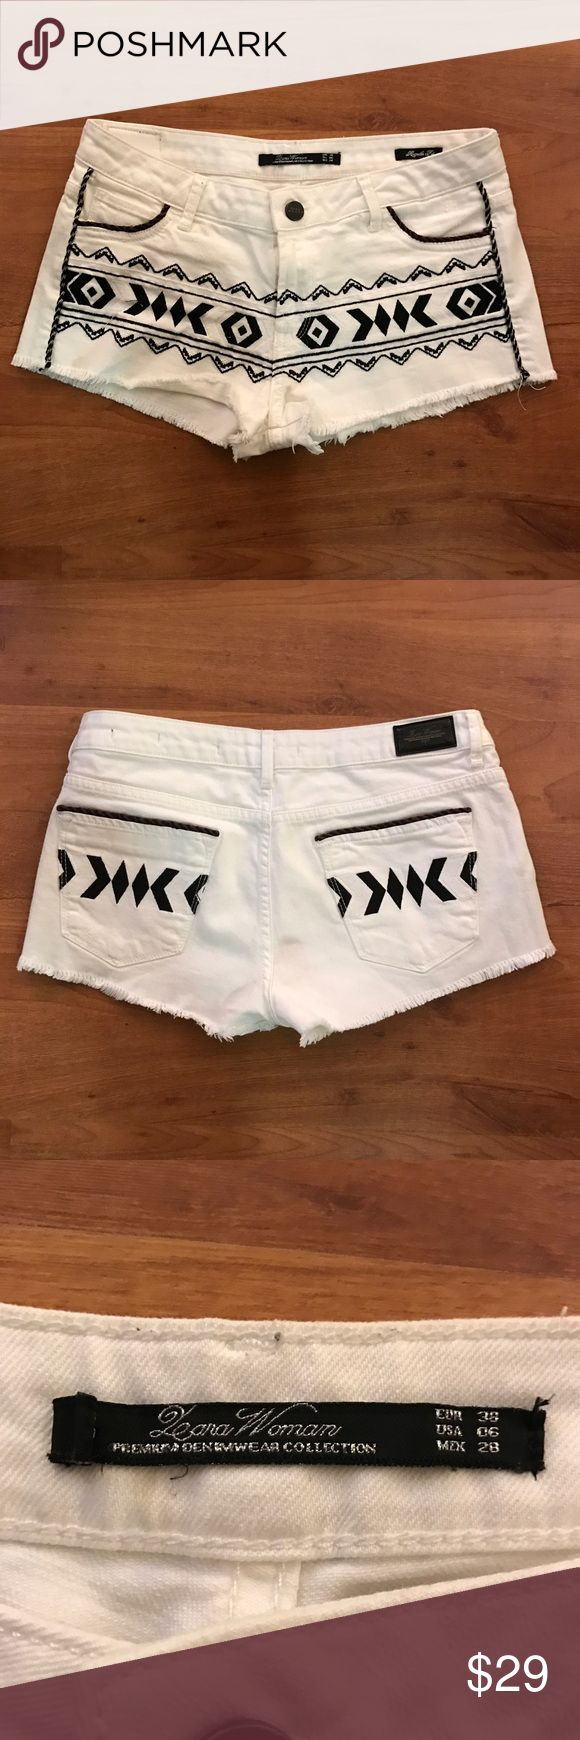 Zara shorts Zara white shorts with embroidery details Zara Shorts